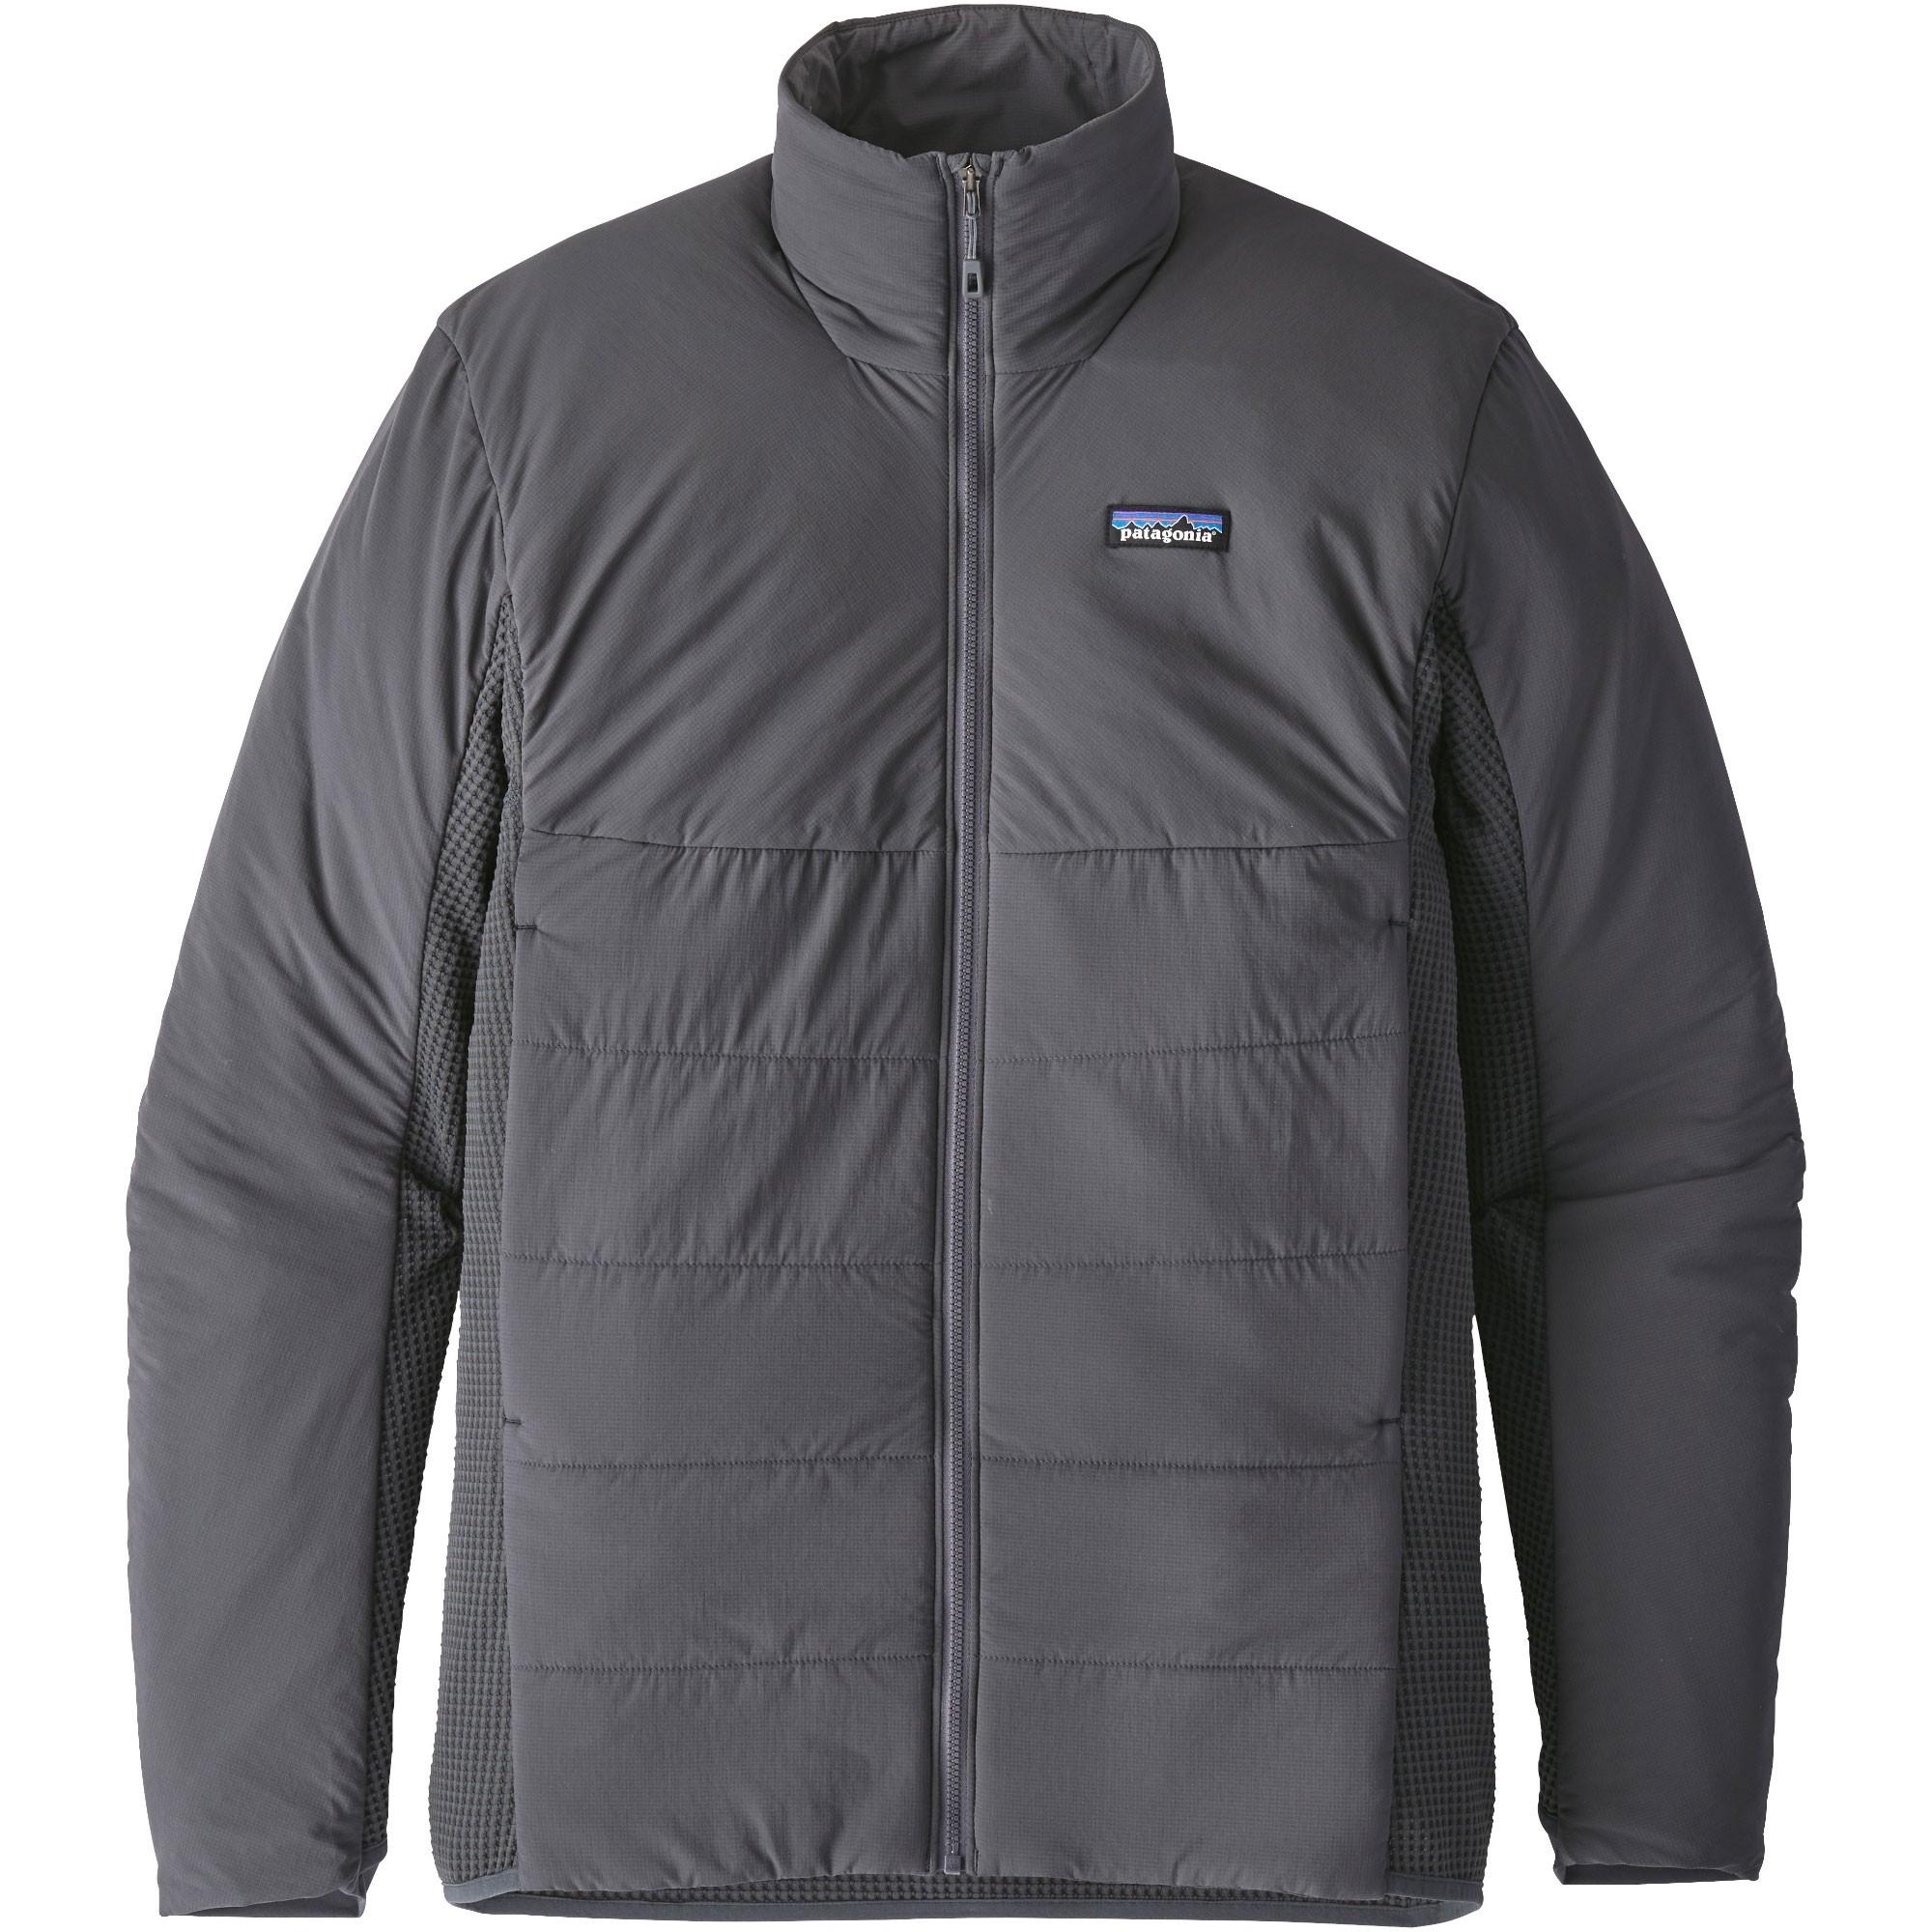 Patagonia Nano-Air Light Hybrid Men's Jacket Forge Grey